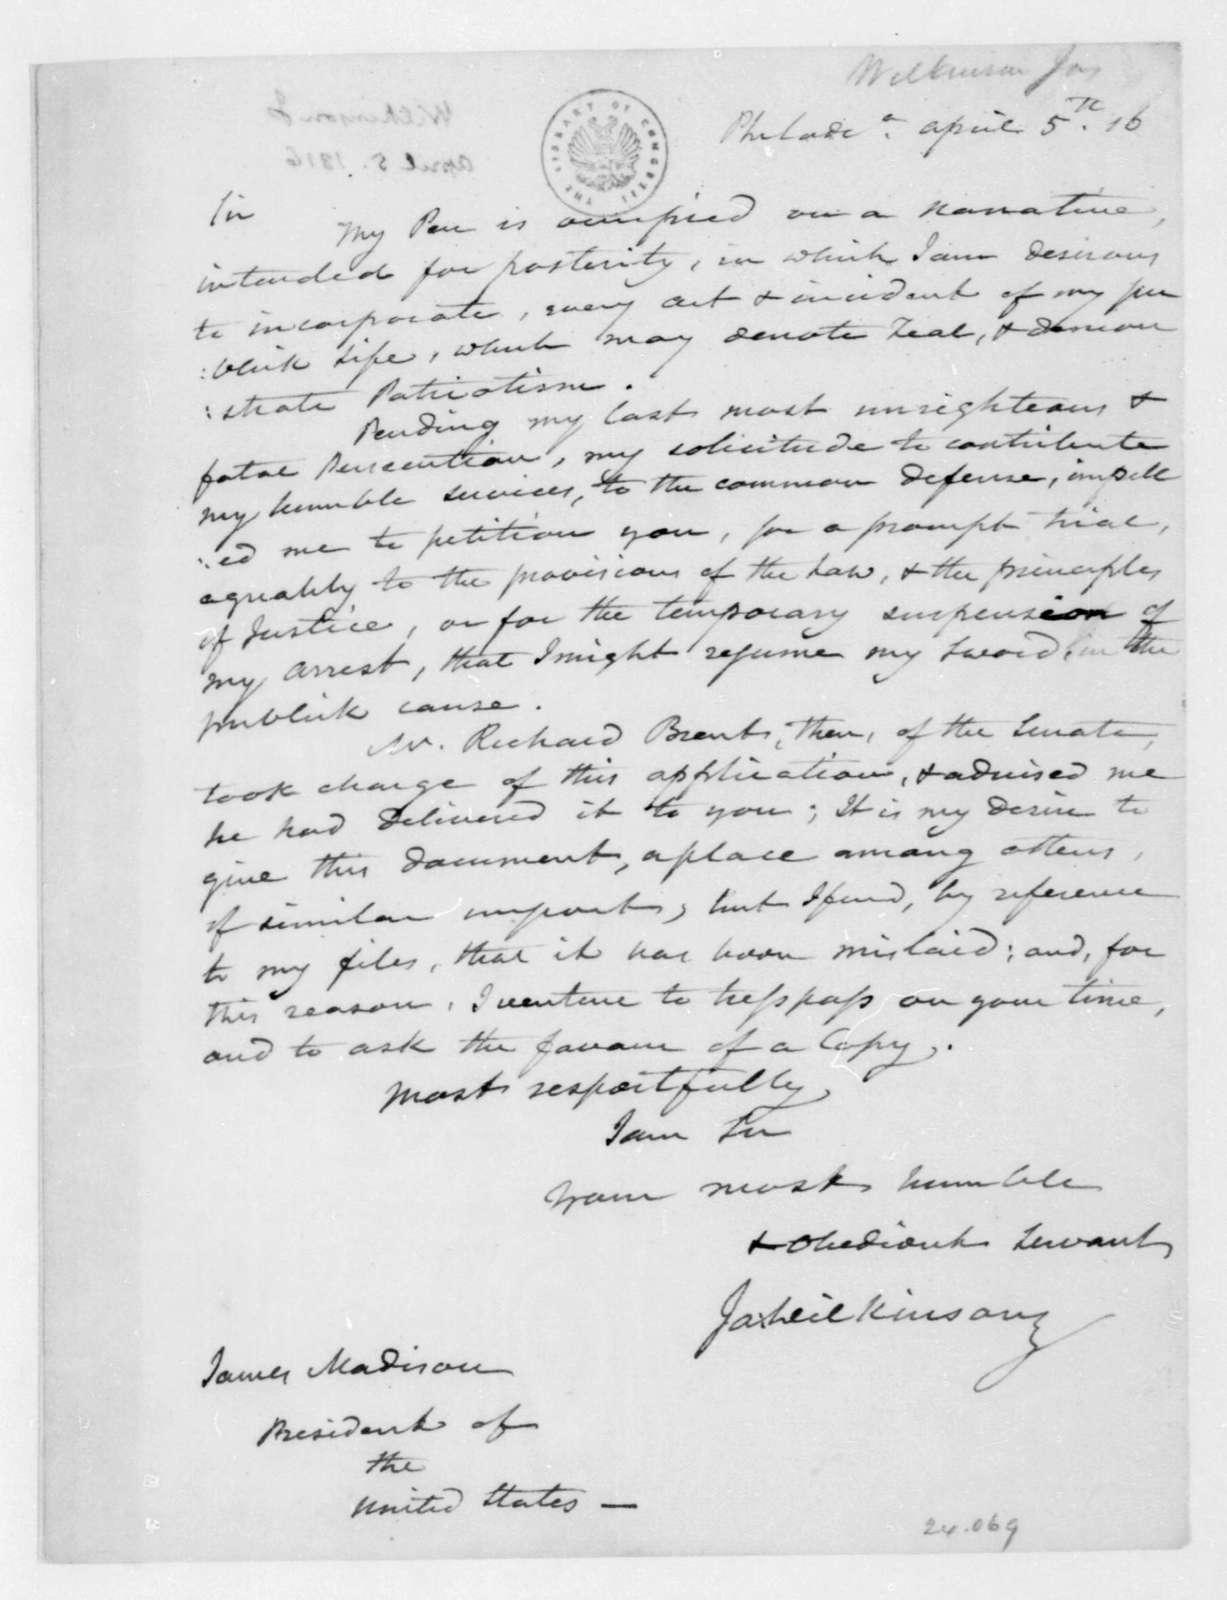 James Wilkinson to James Madison, April 5, 1816.